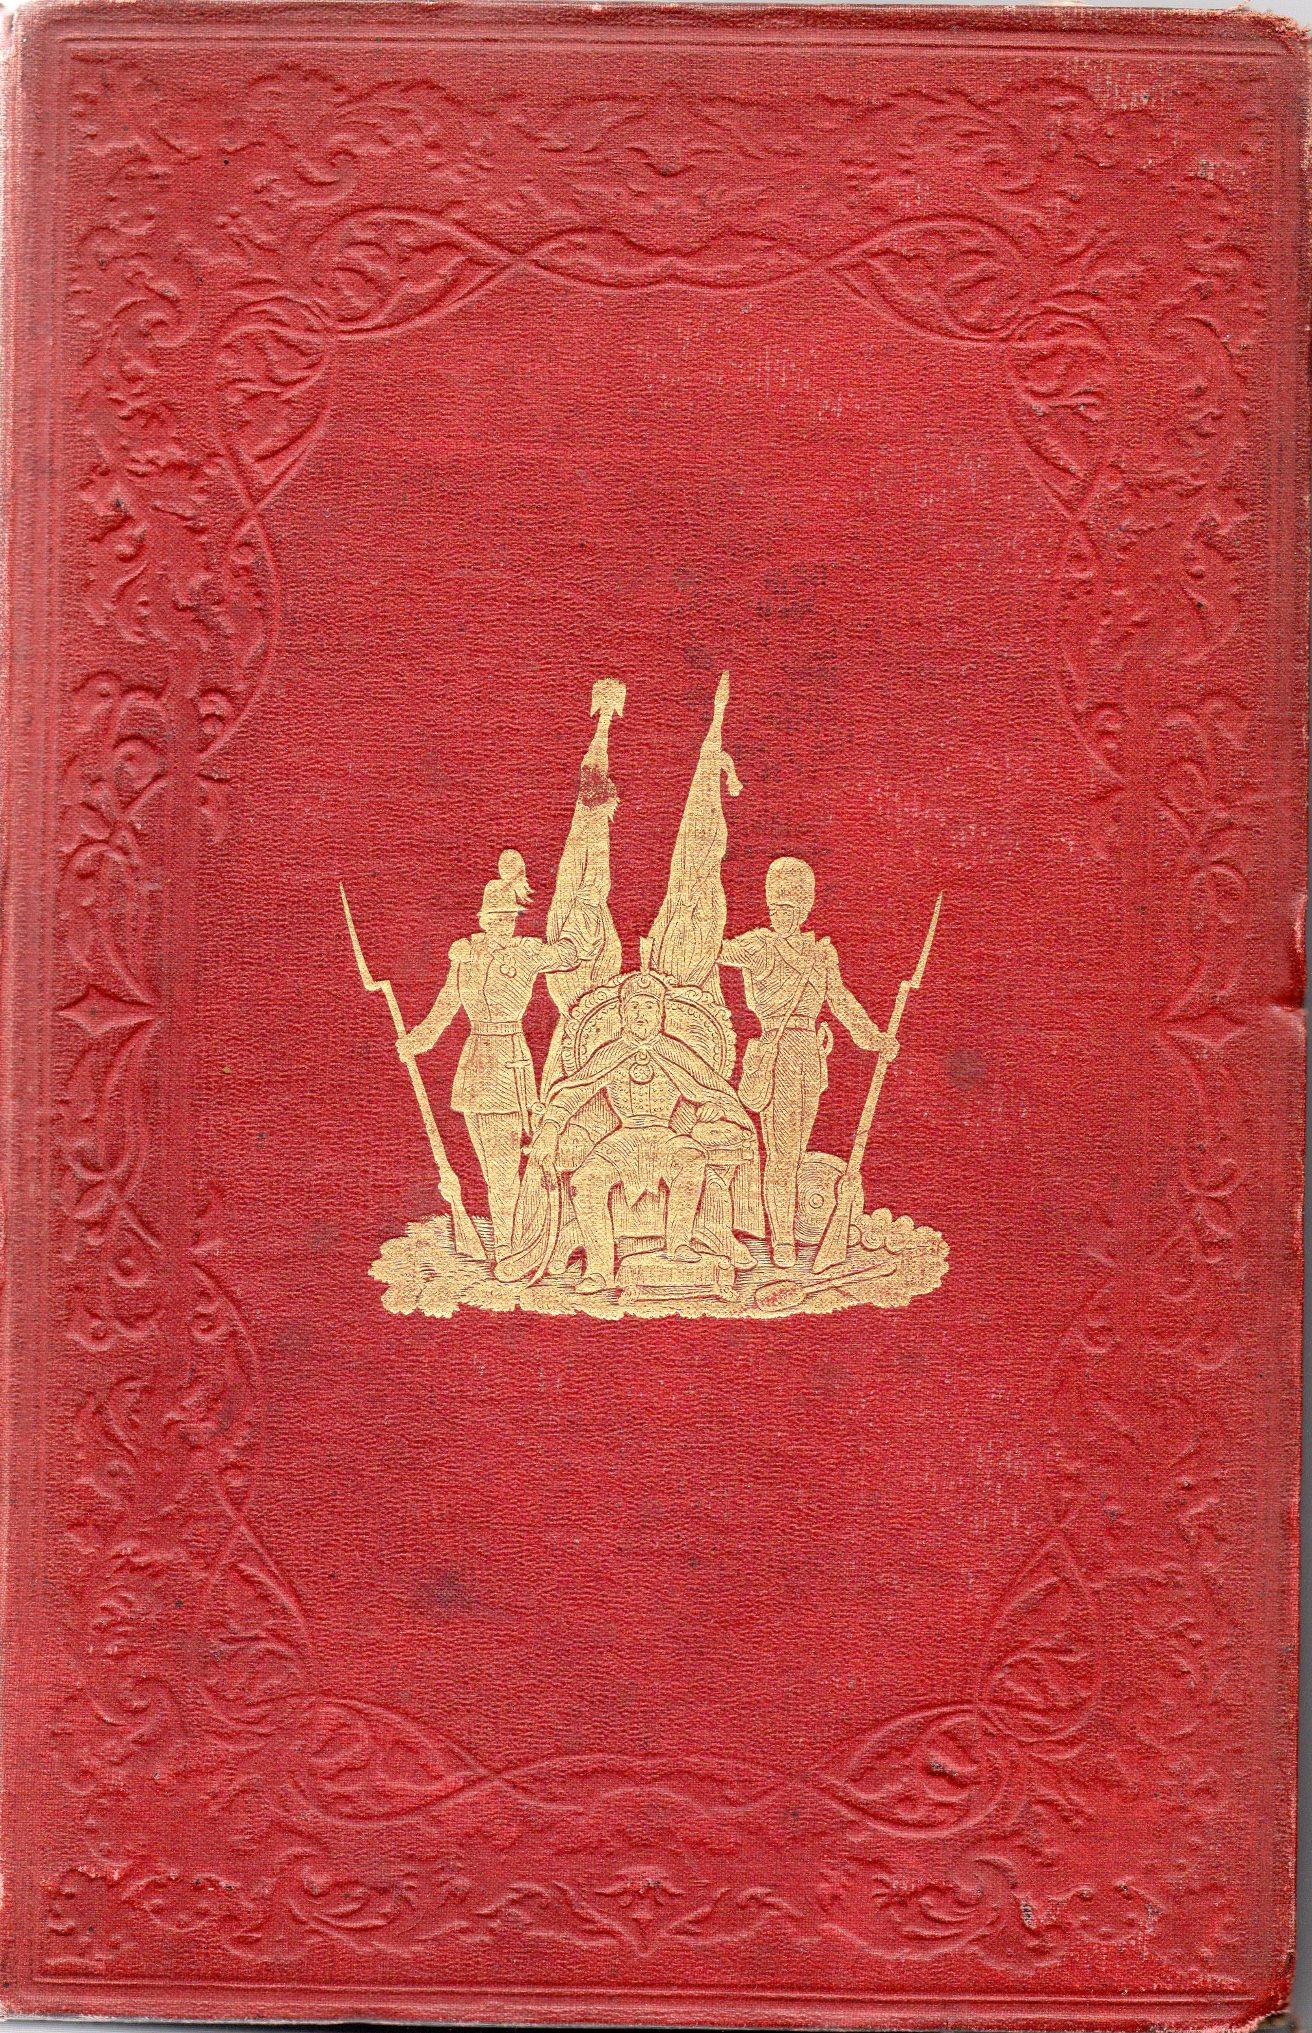 "Книга ""Nolan E. H. "" The history of the War Against Russia. Illustrated. Т. VІІІ"" / Нолан Е. ""Історія війни проти Росії. Ілюстрована. Т. VІІІ"""